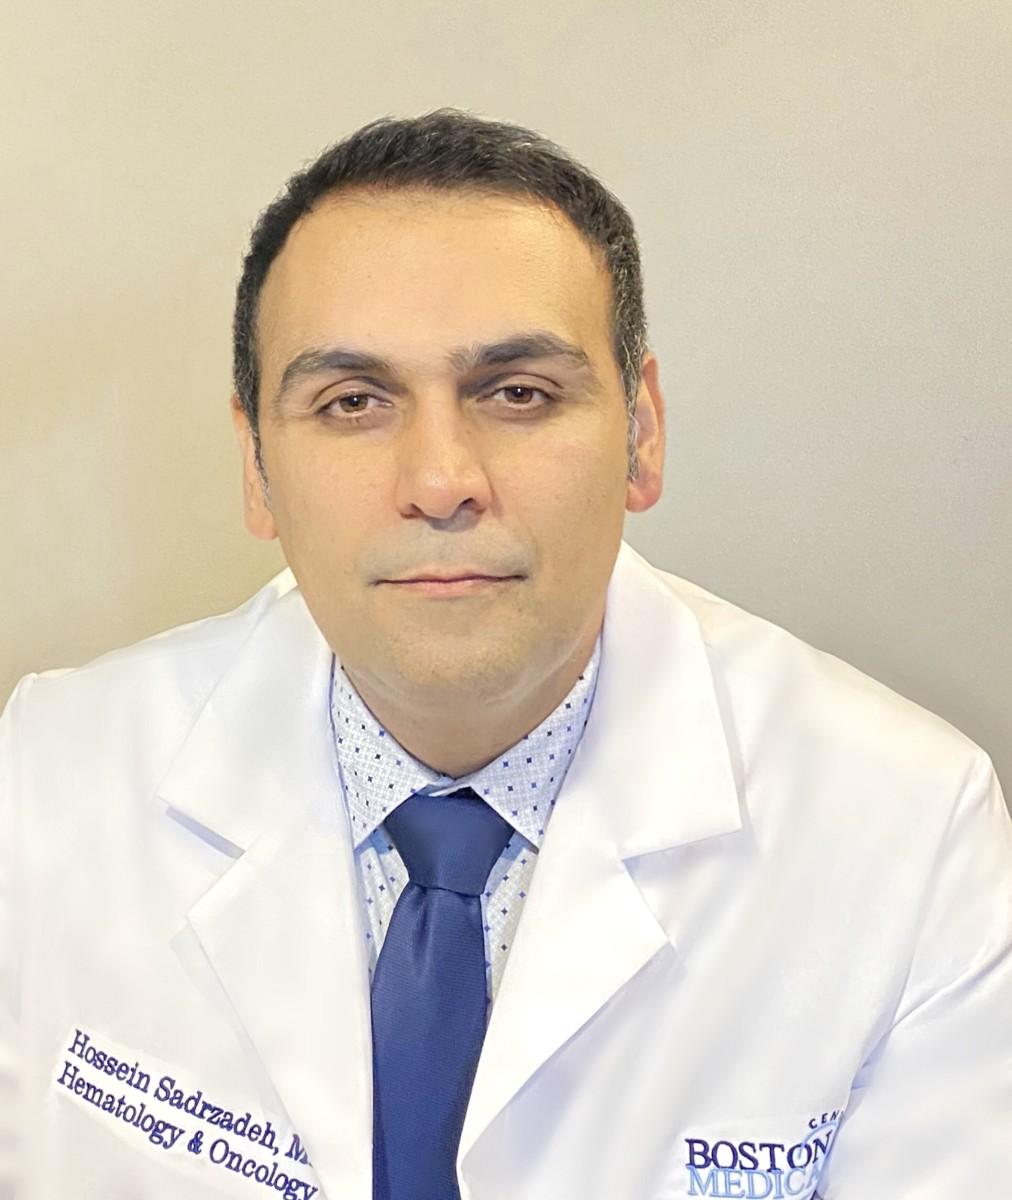 Hossein bmc